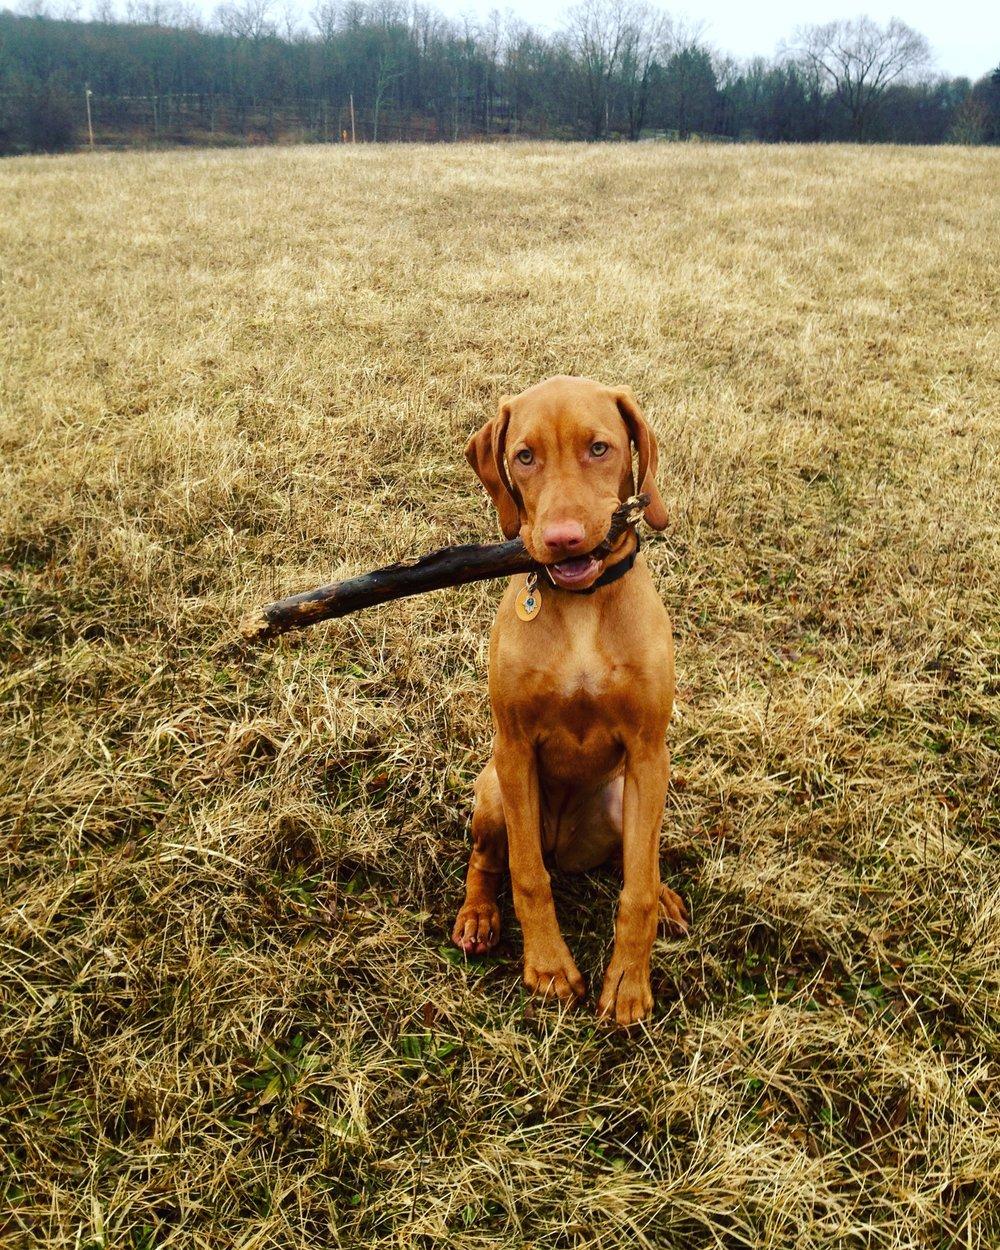 Farm Pup Penelope enjoying a stick.